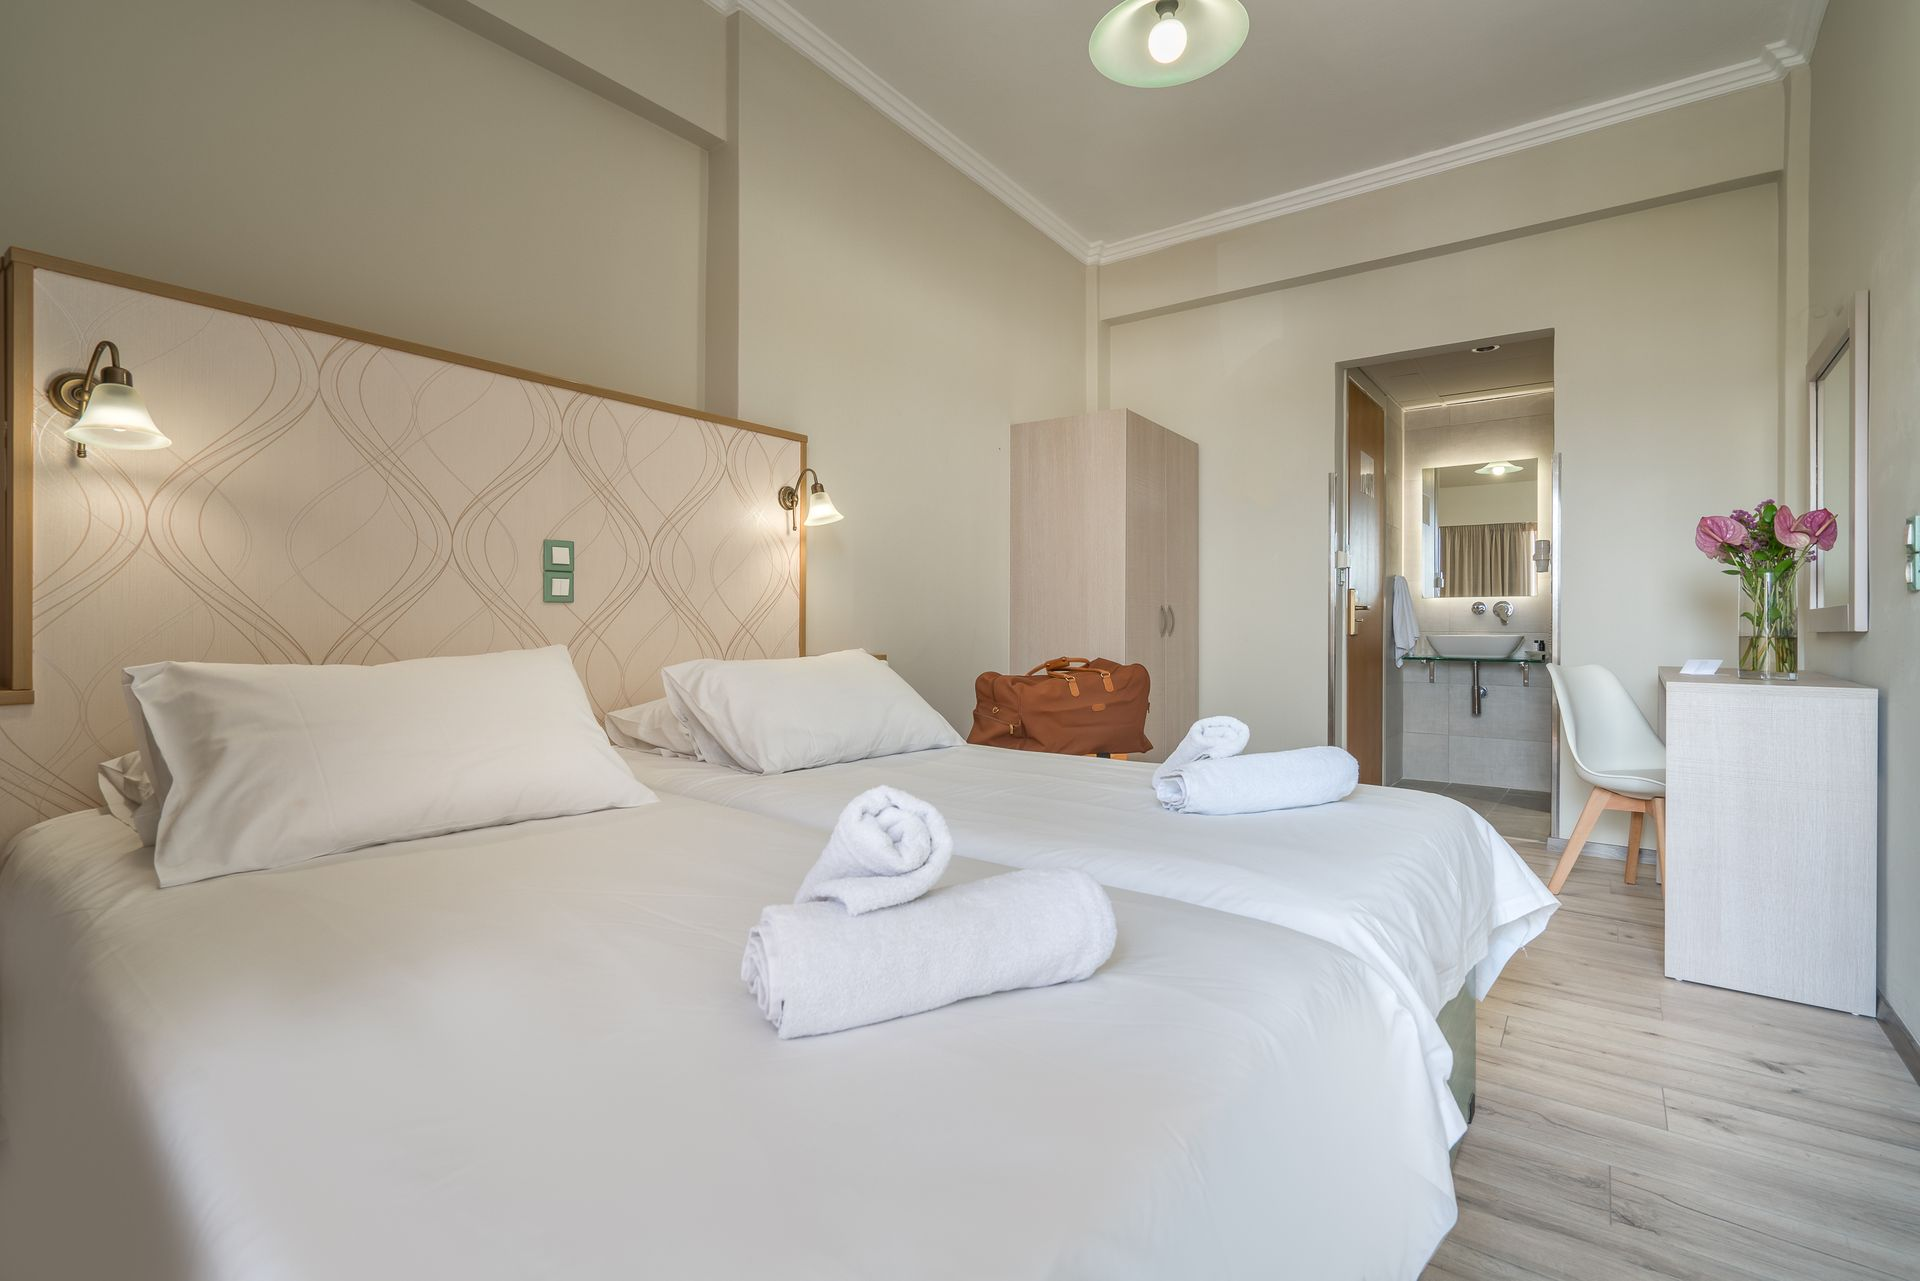 Phoenix Hotel Zante - Ζάκυνθος ✦ 3 Ημέρες (2 Διανυκτερεύσεις)